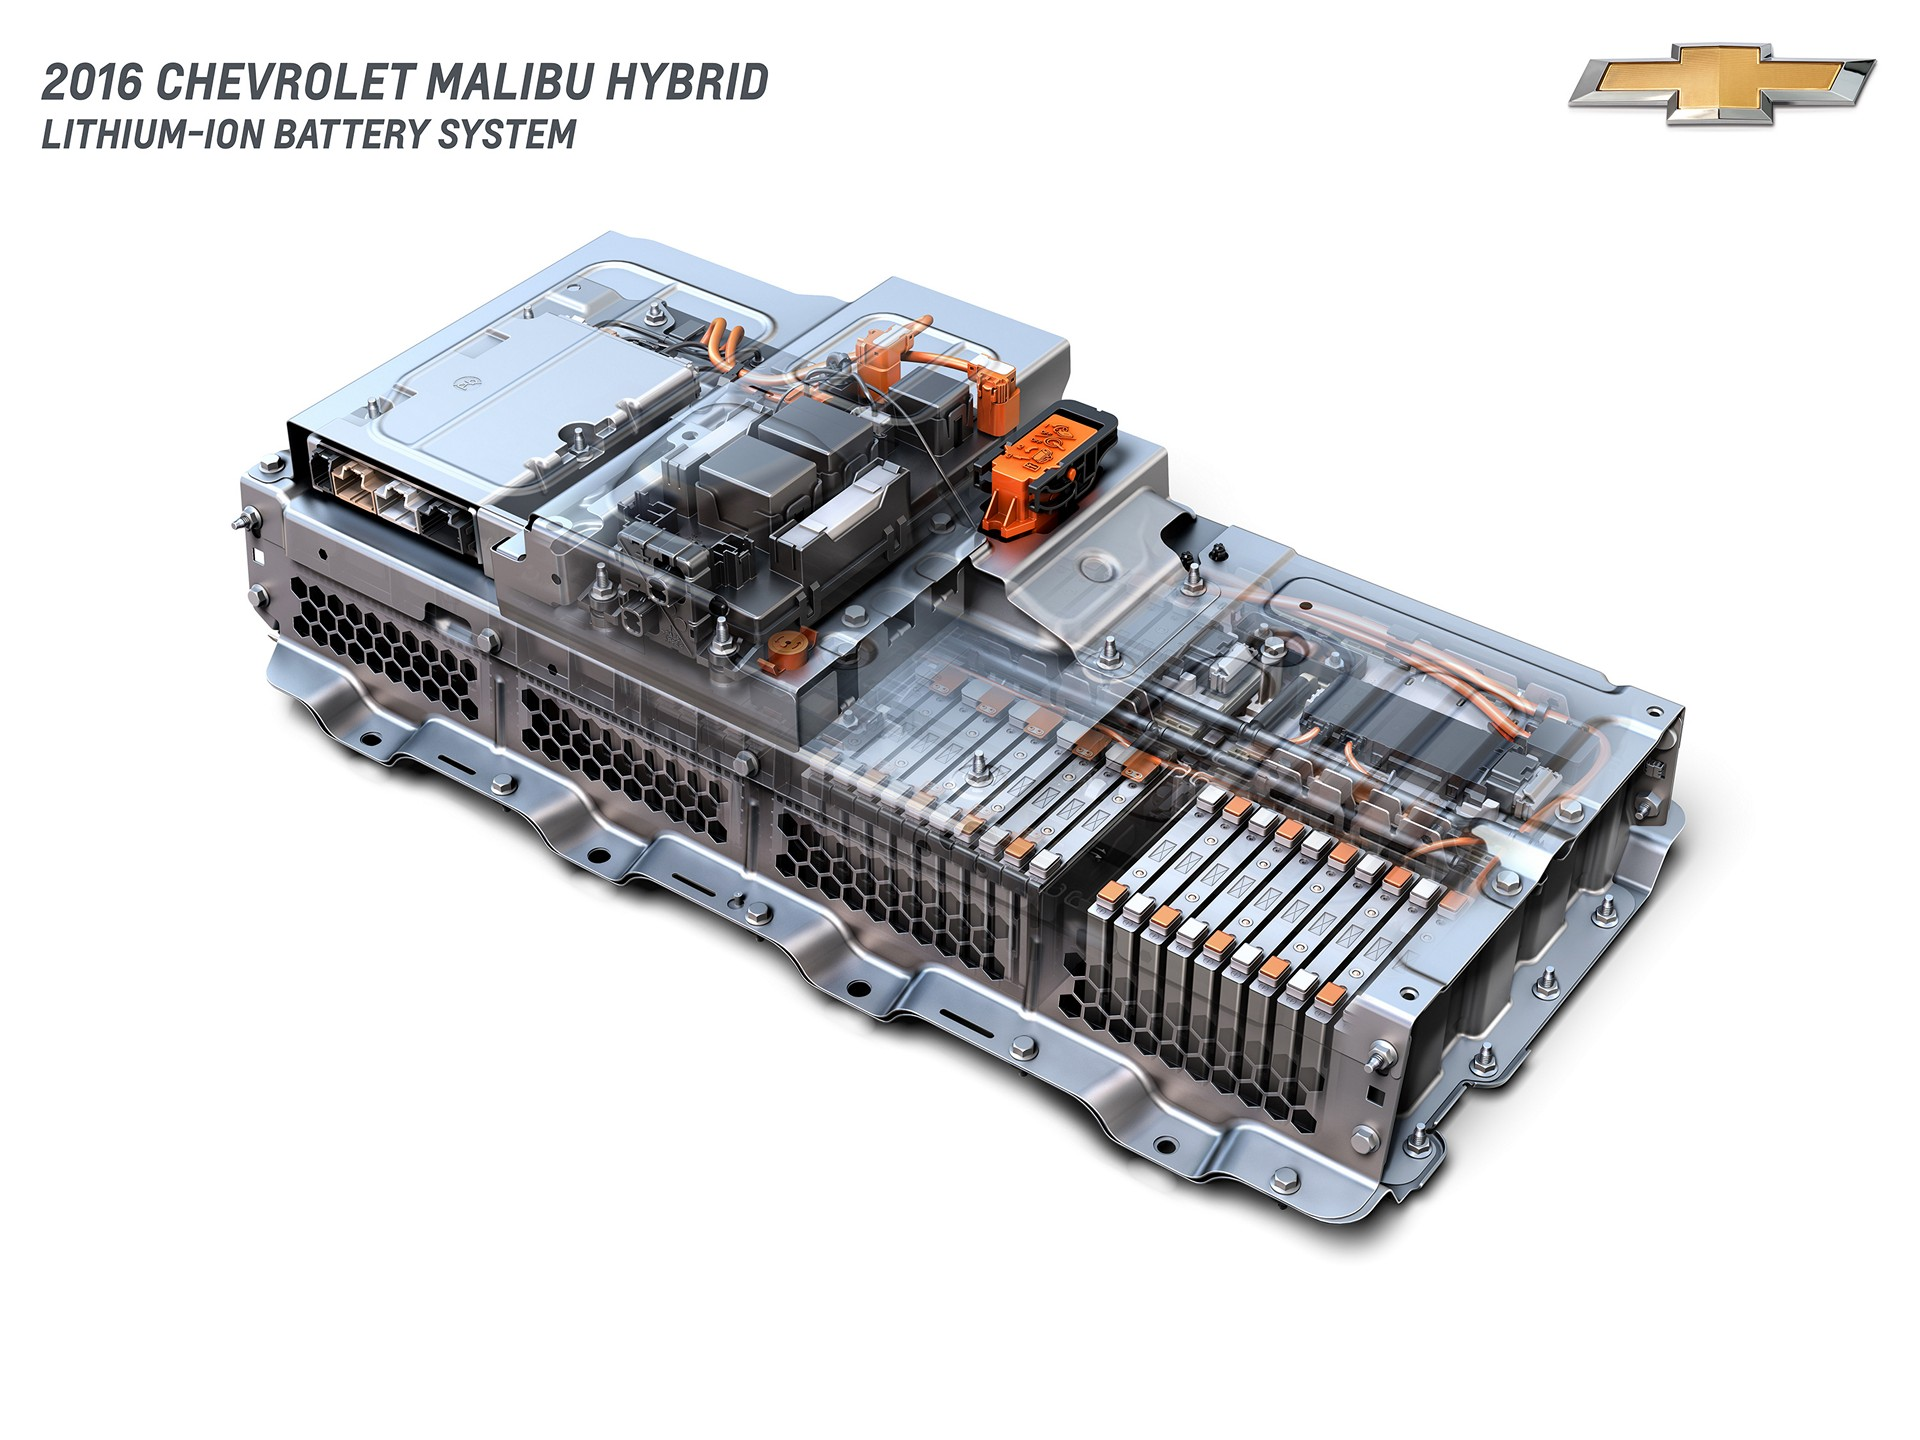 2016 Chevrolet Malibu Hybrid Lithium-Ion Battery System © General Motors